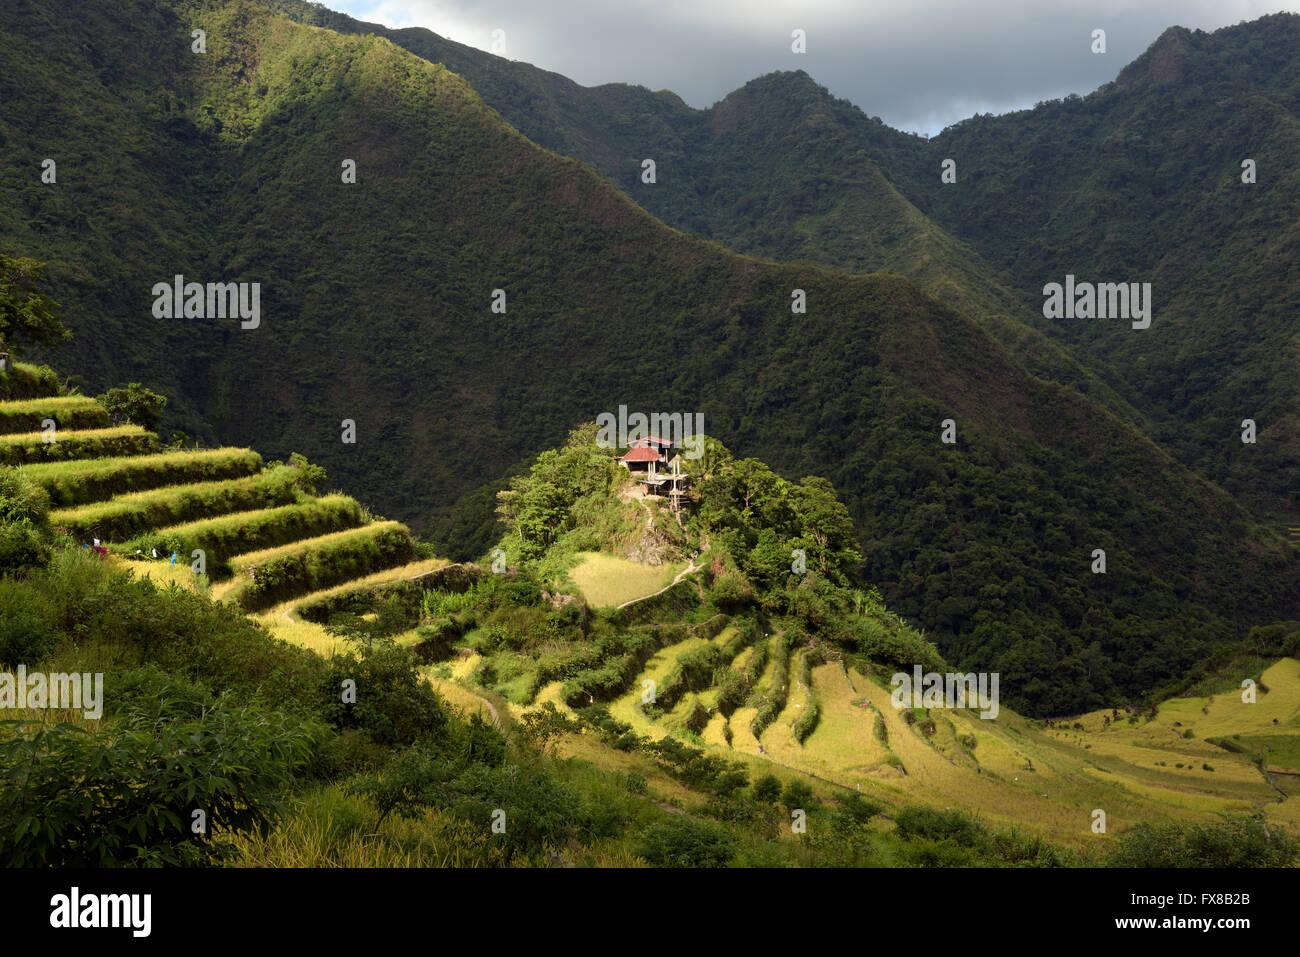 Batad rice terraces in Ifugao, Philippines. - Stock Image